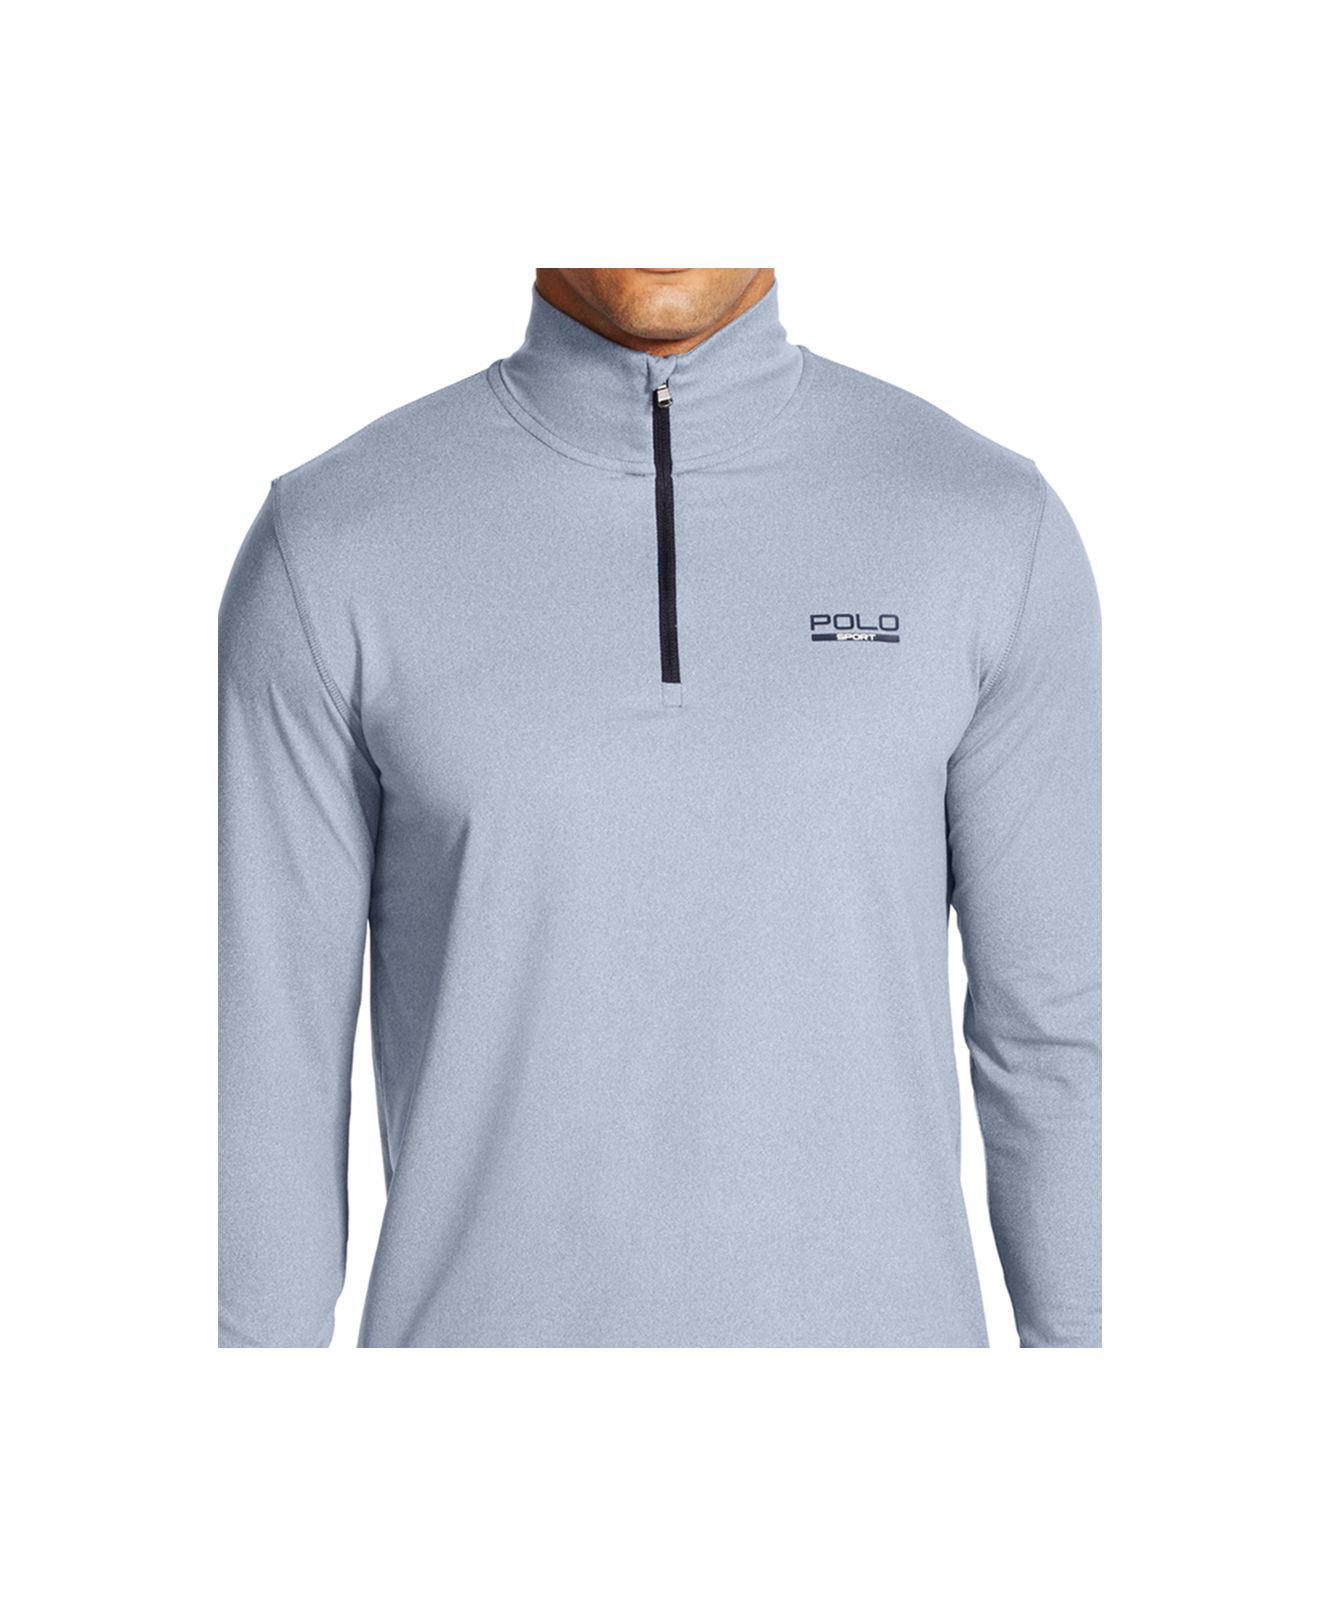 polo ralph lauren stretch jersey pullover in blue for men. Black Bedroom Furniture Sets. Home Design Ideas